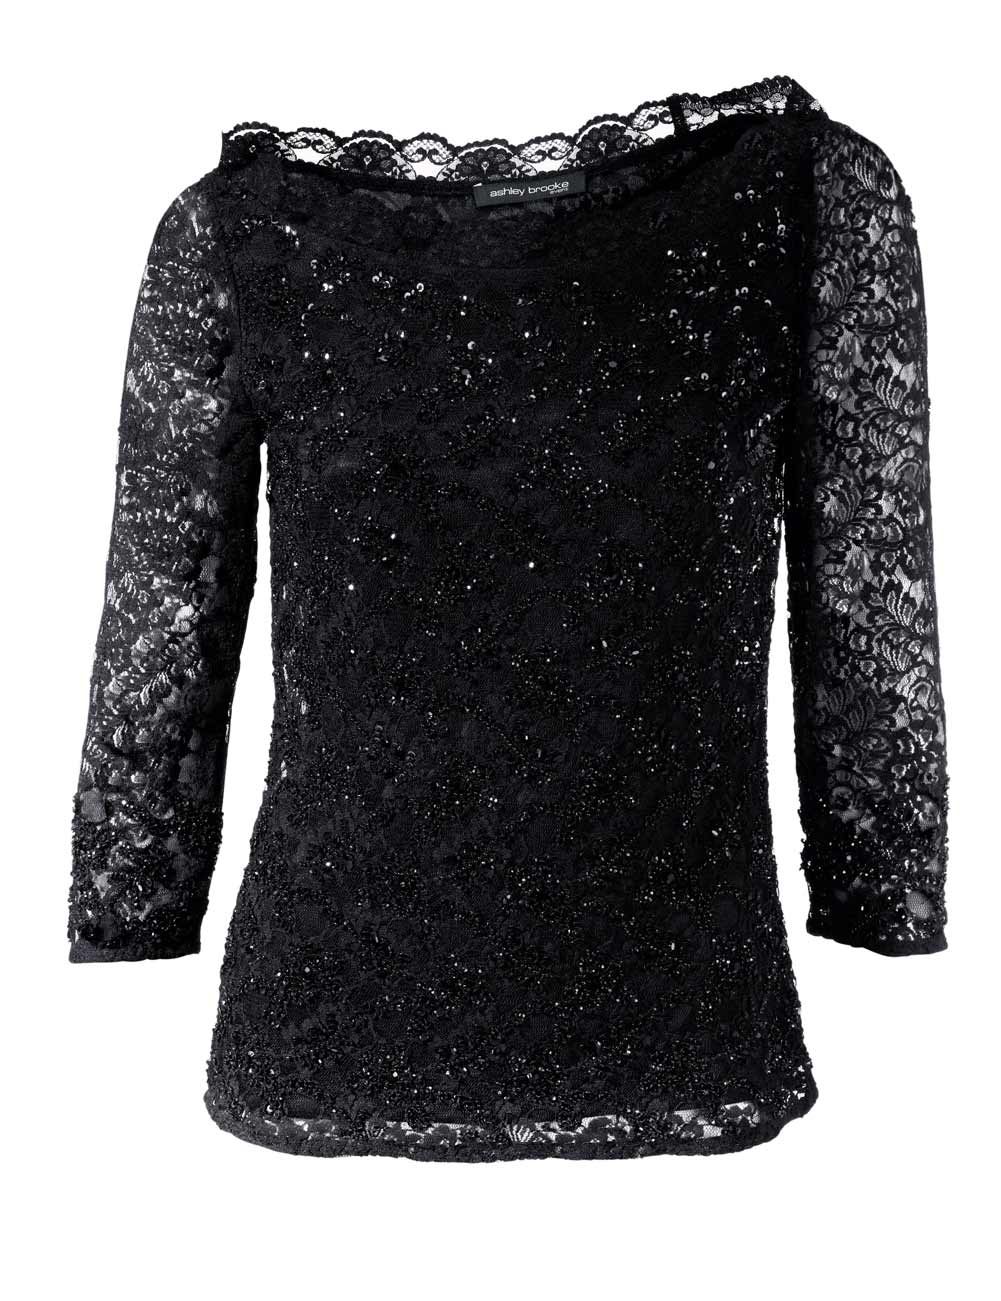 008.616 ASHLEY BROOKE Damen Designer-Spitzenshirt m. Pailletten Schwarz